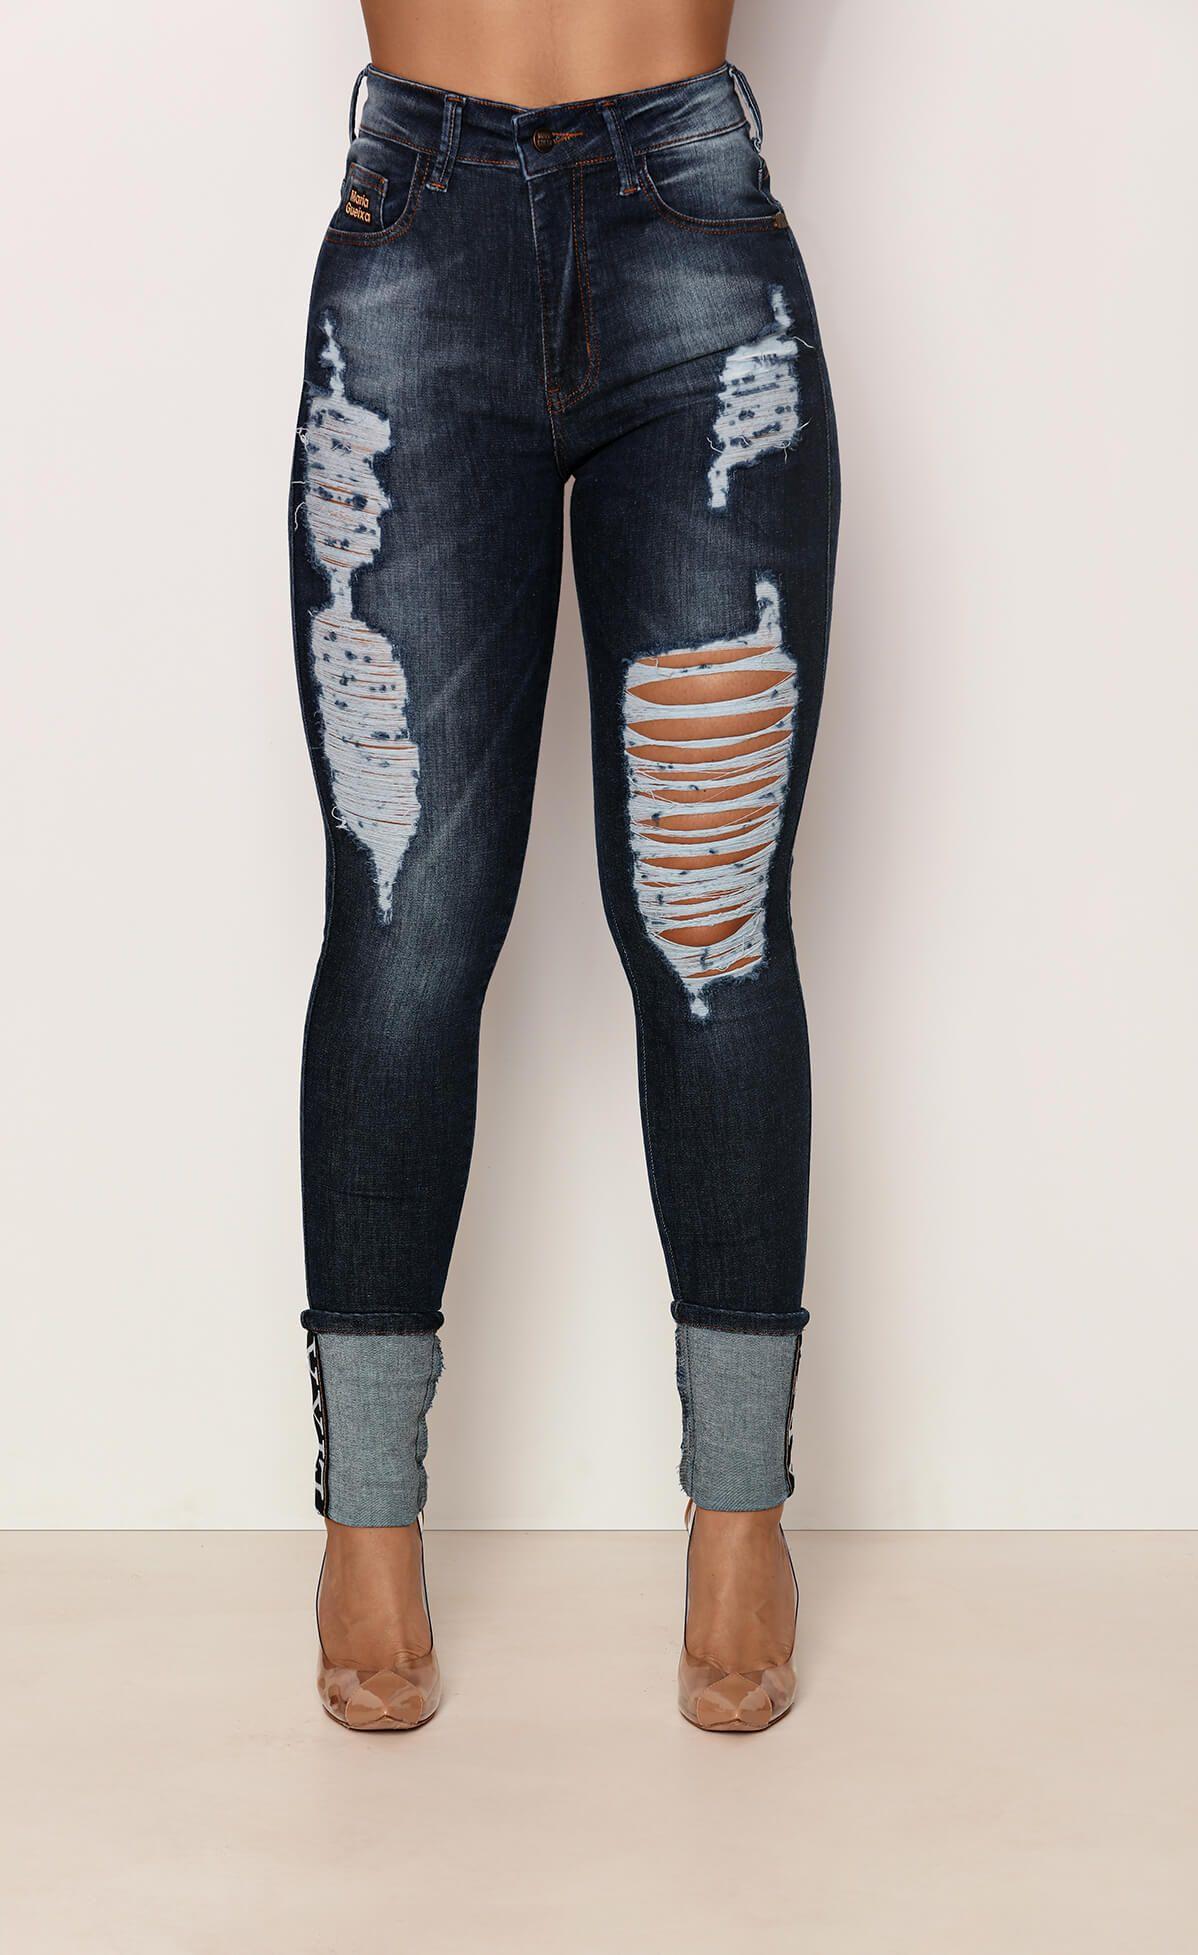 Calça Jeans Destroyed Barra Dobrada Maria Gueixa Jeans Escuro